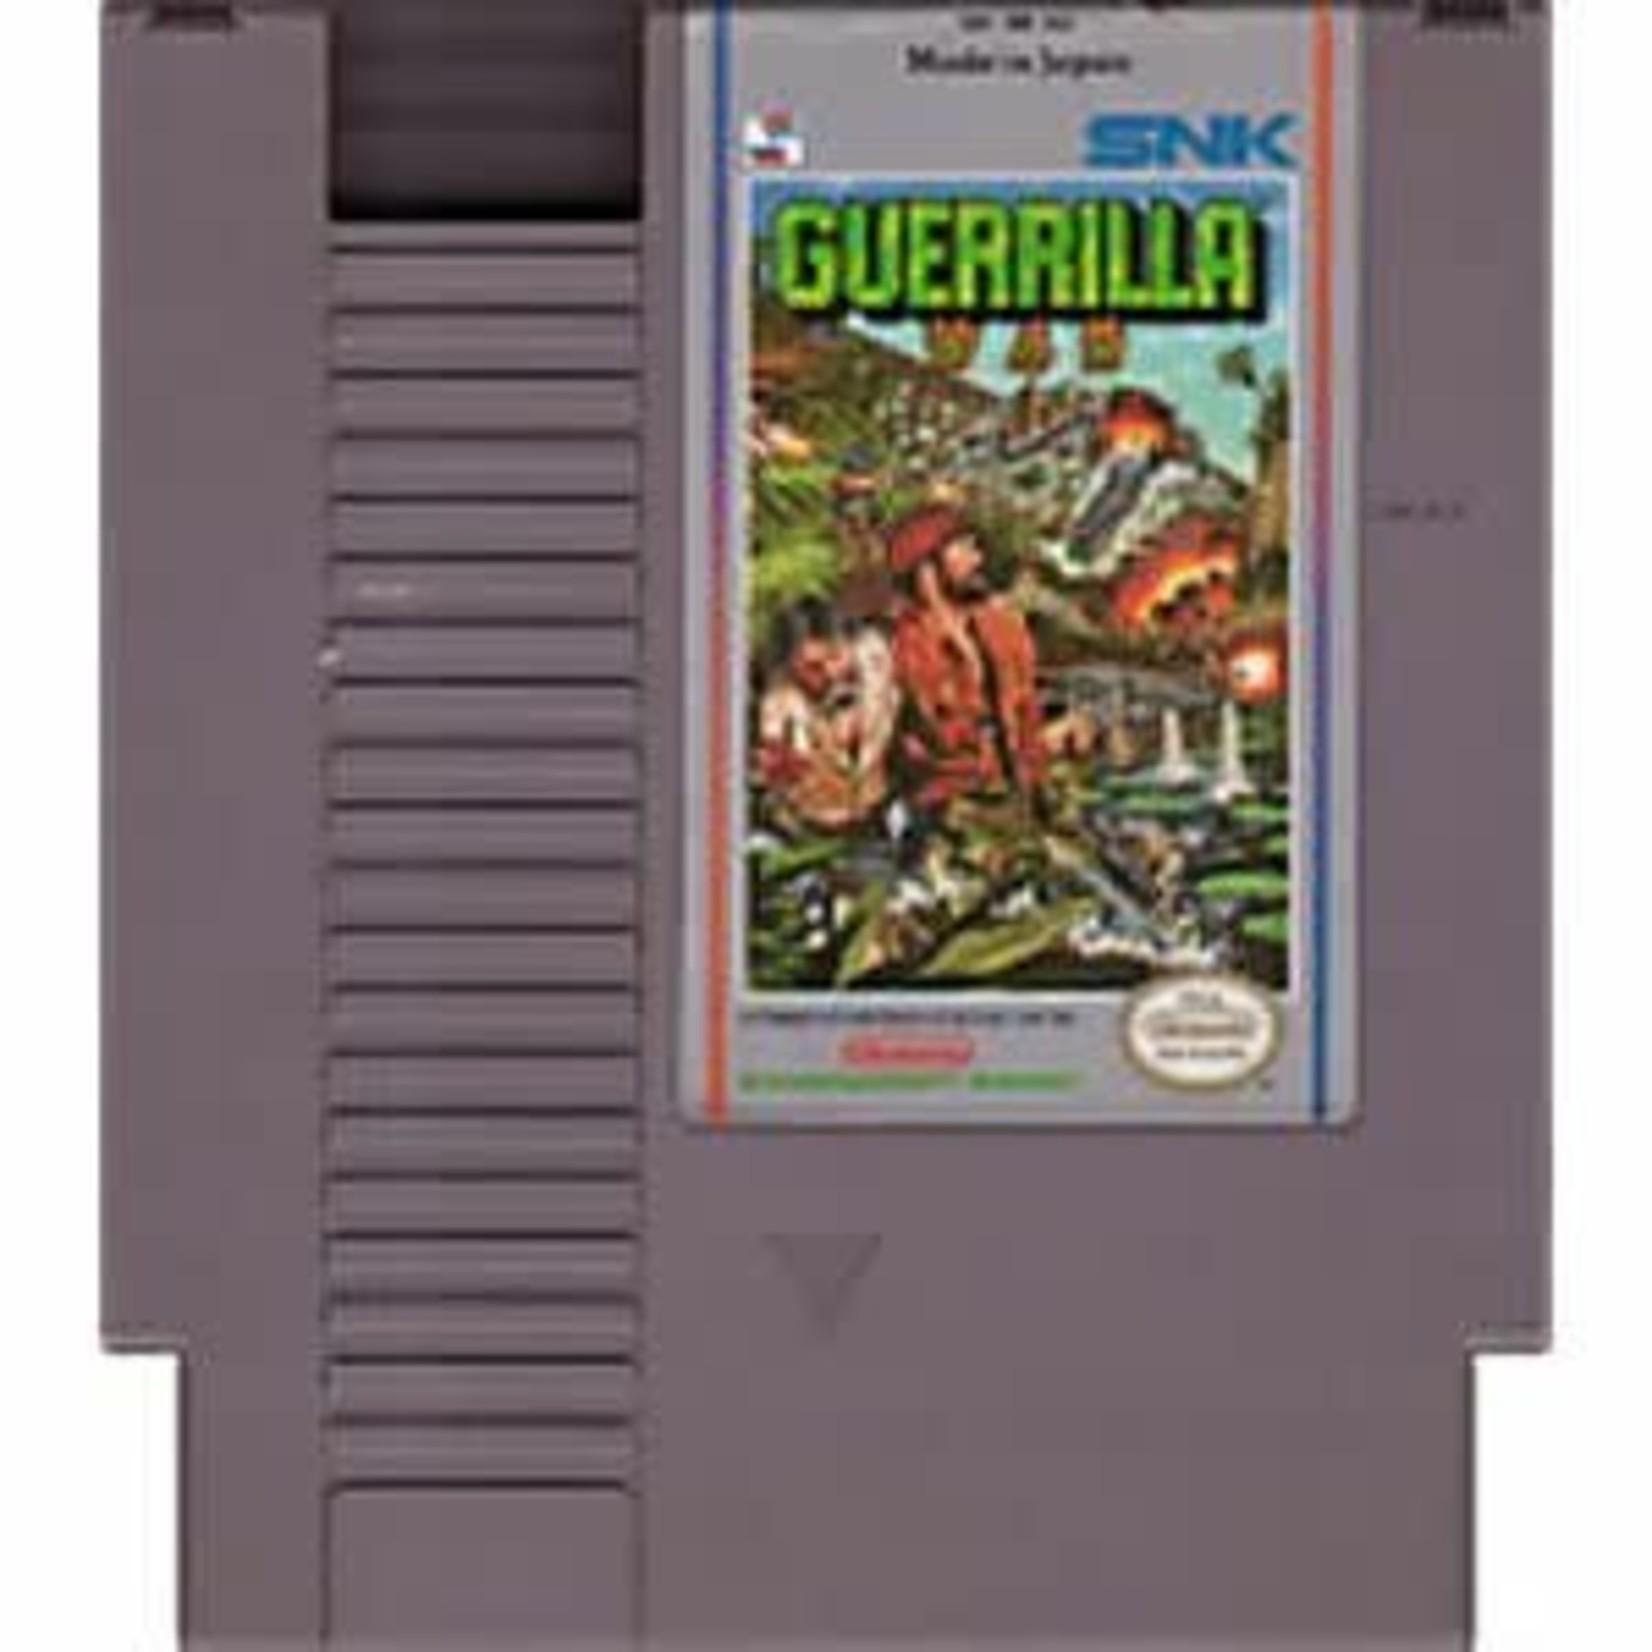 nesu-Guerrilla War (cartridge)